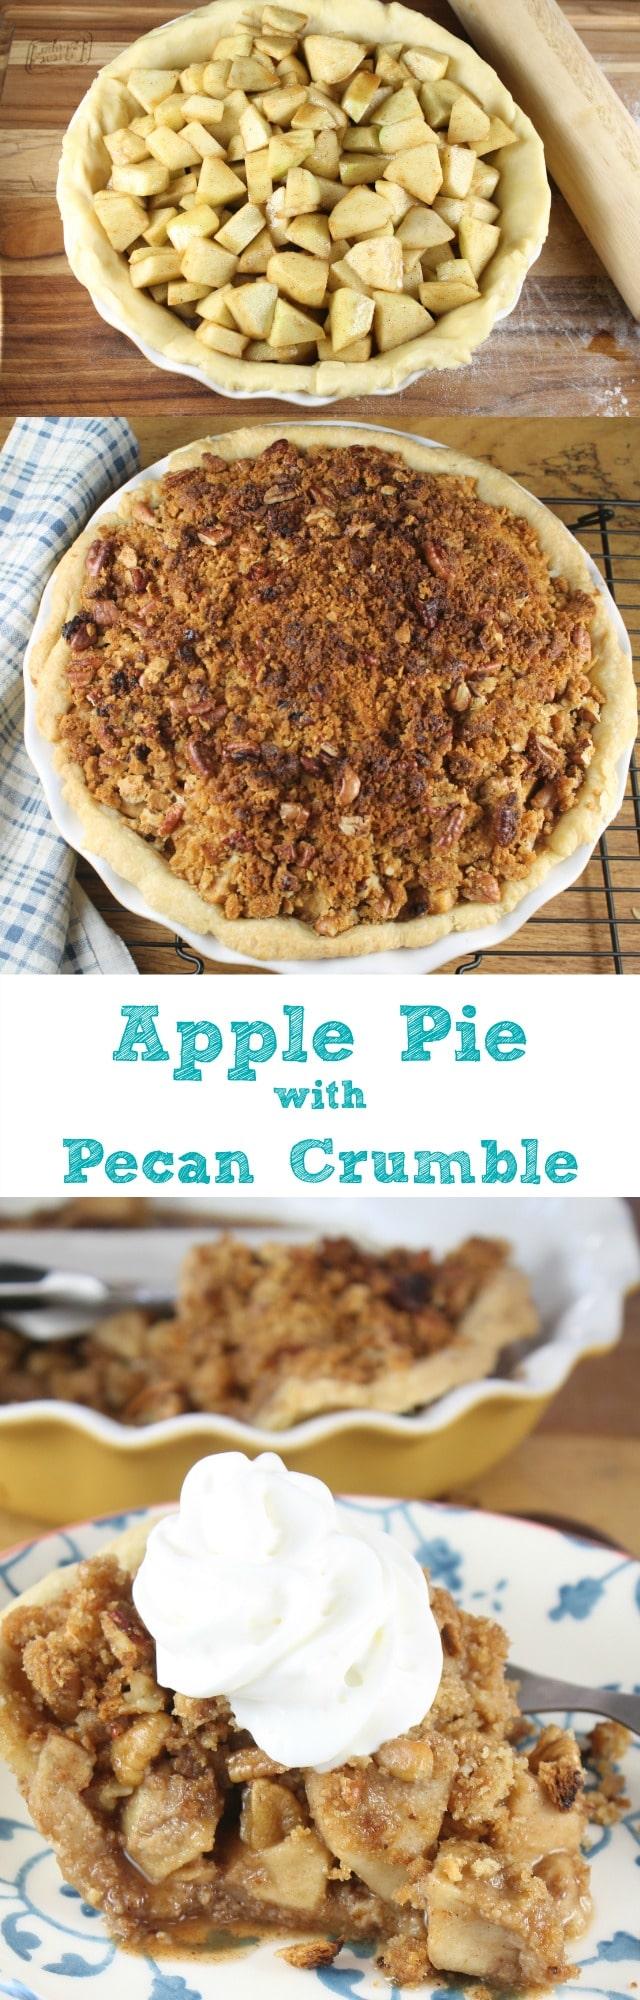 Apple Pie with Pecan Crumble Recipe found at missinthekitchen.com